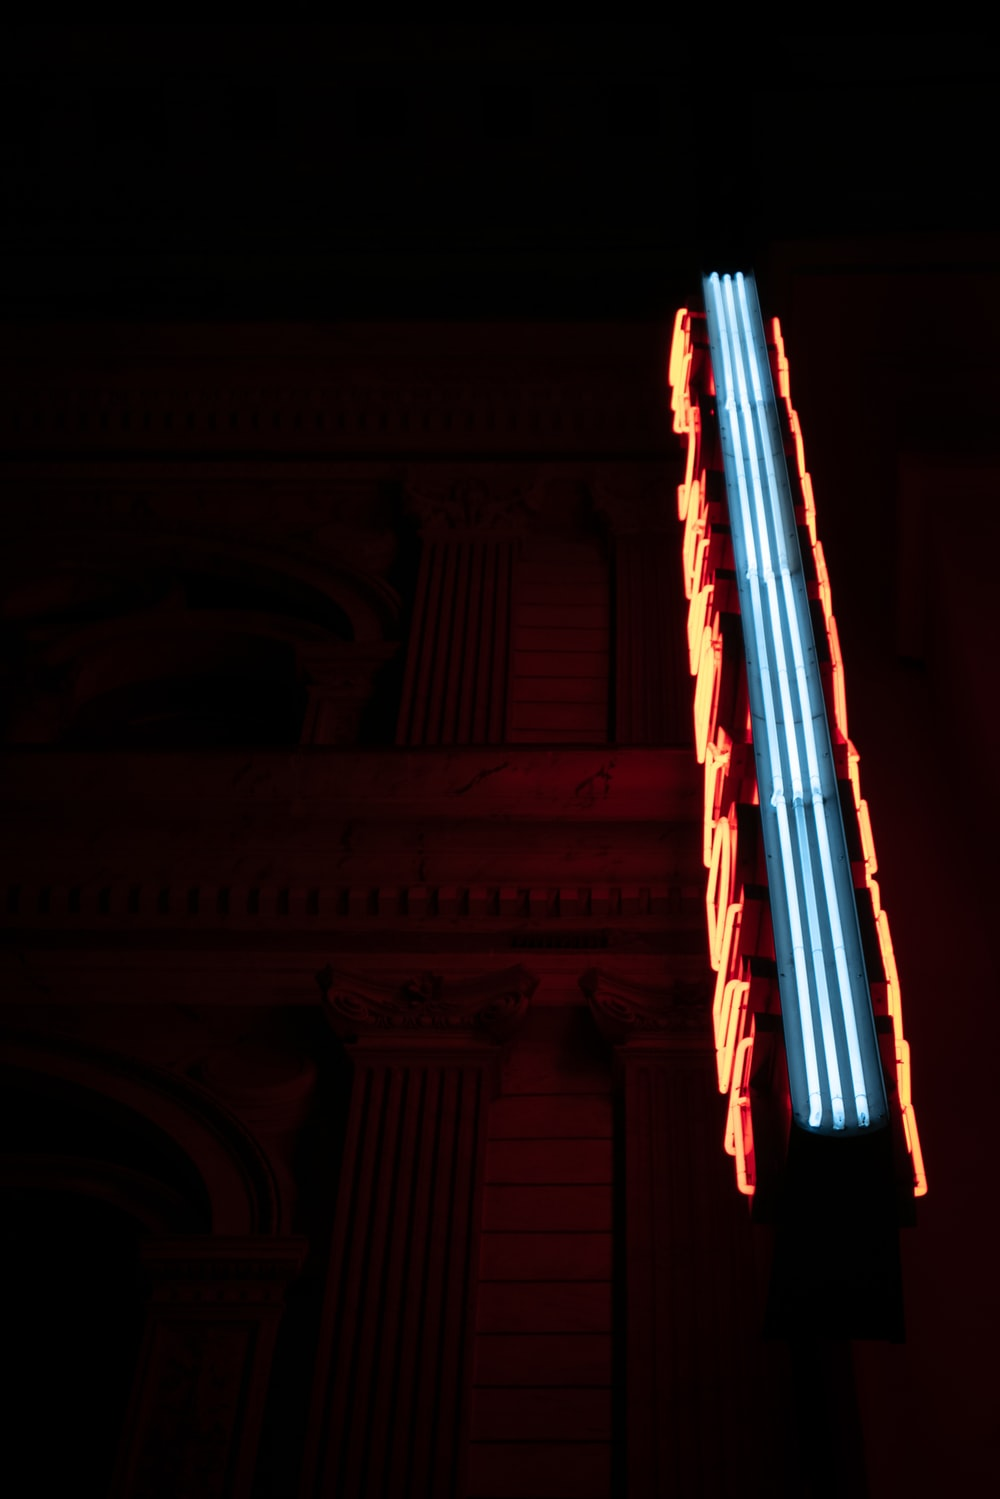 blue and orange neon sigange